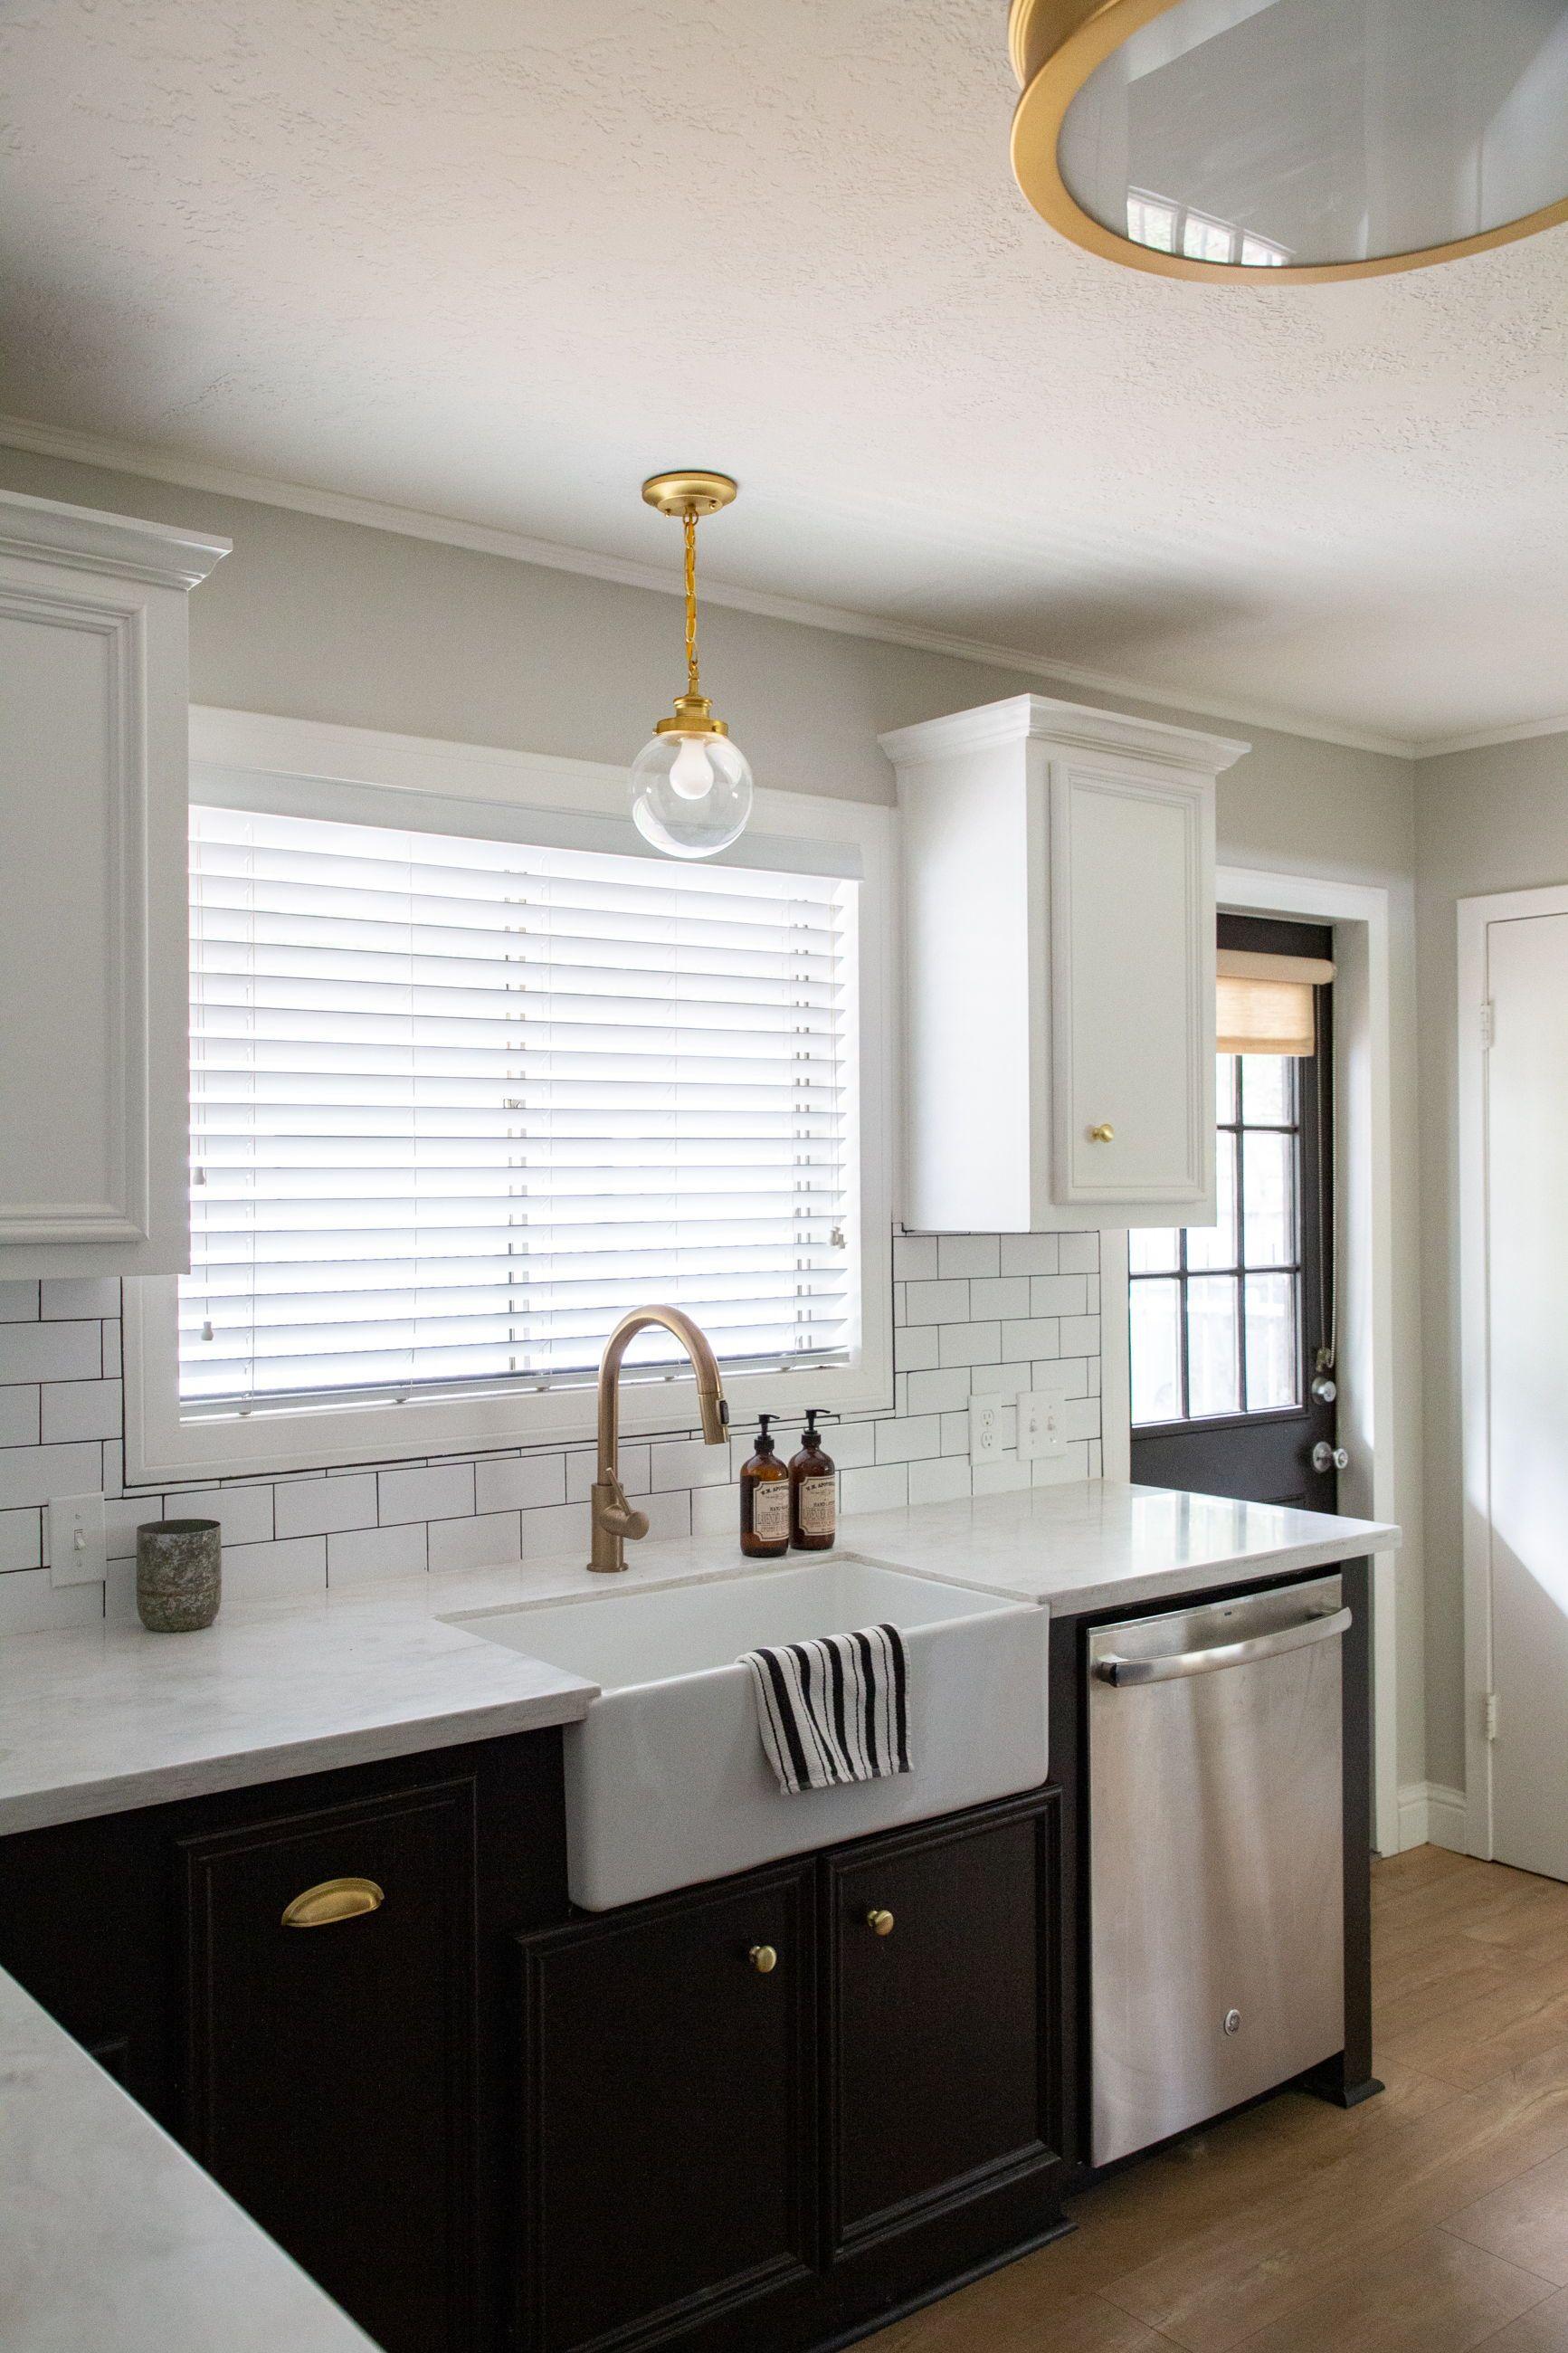 f25808bbcb350e422754eedbf8b673ff - Get Low Budget Simple Modern Small House Interior Design Background